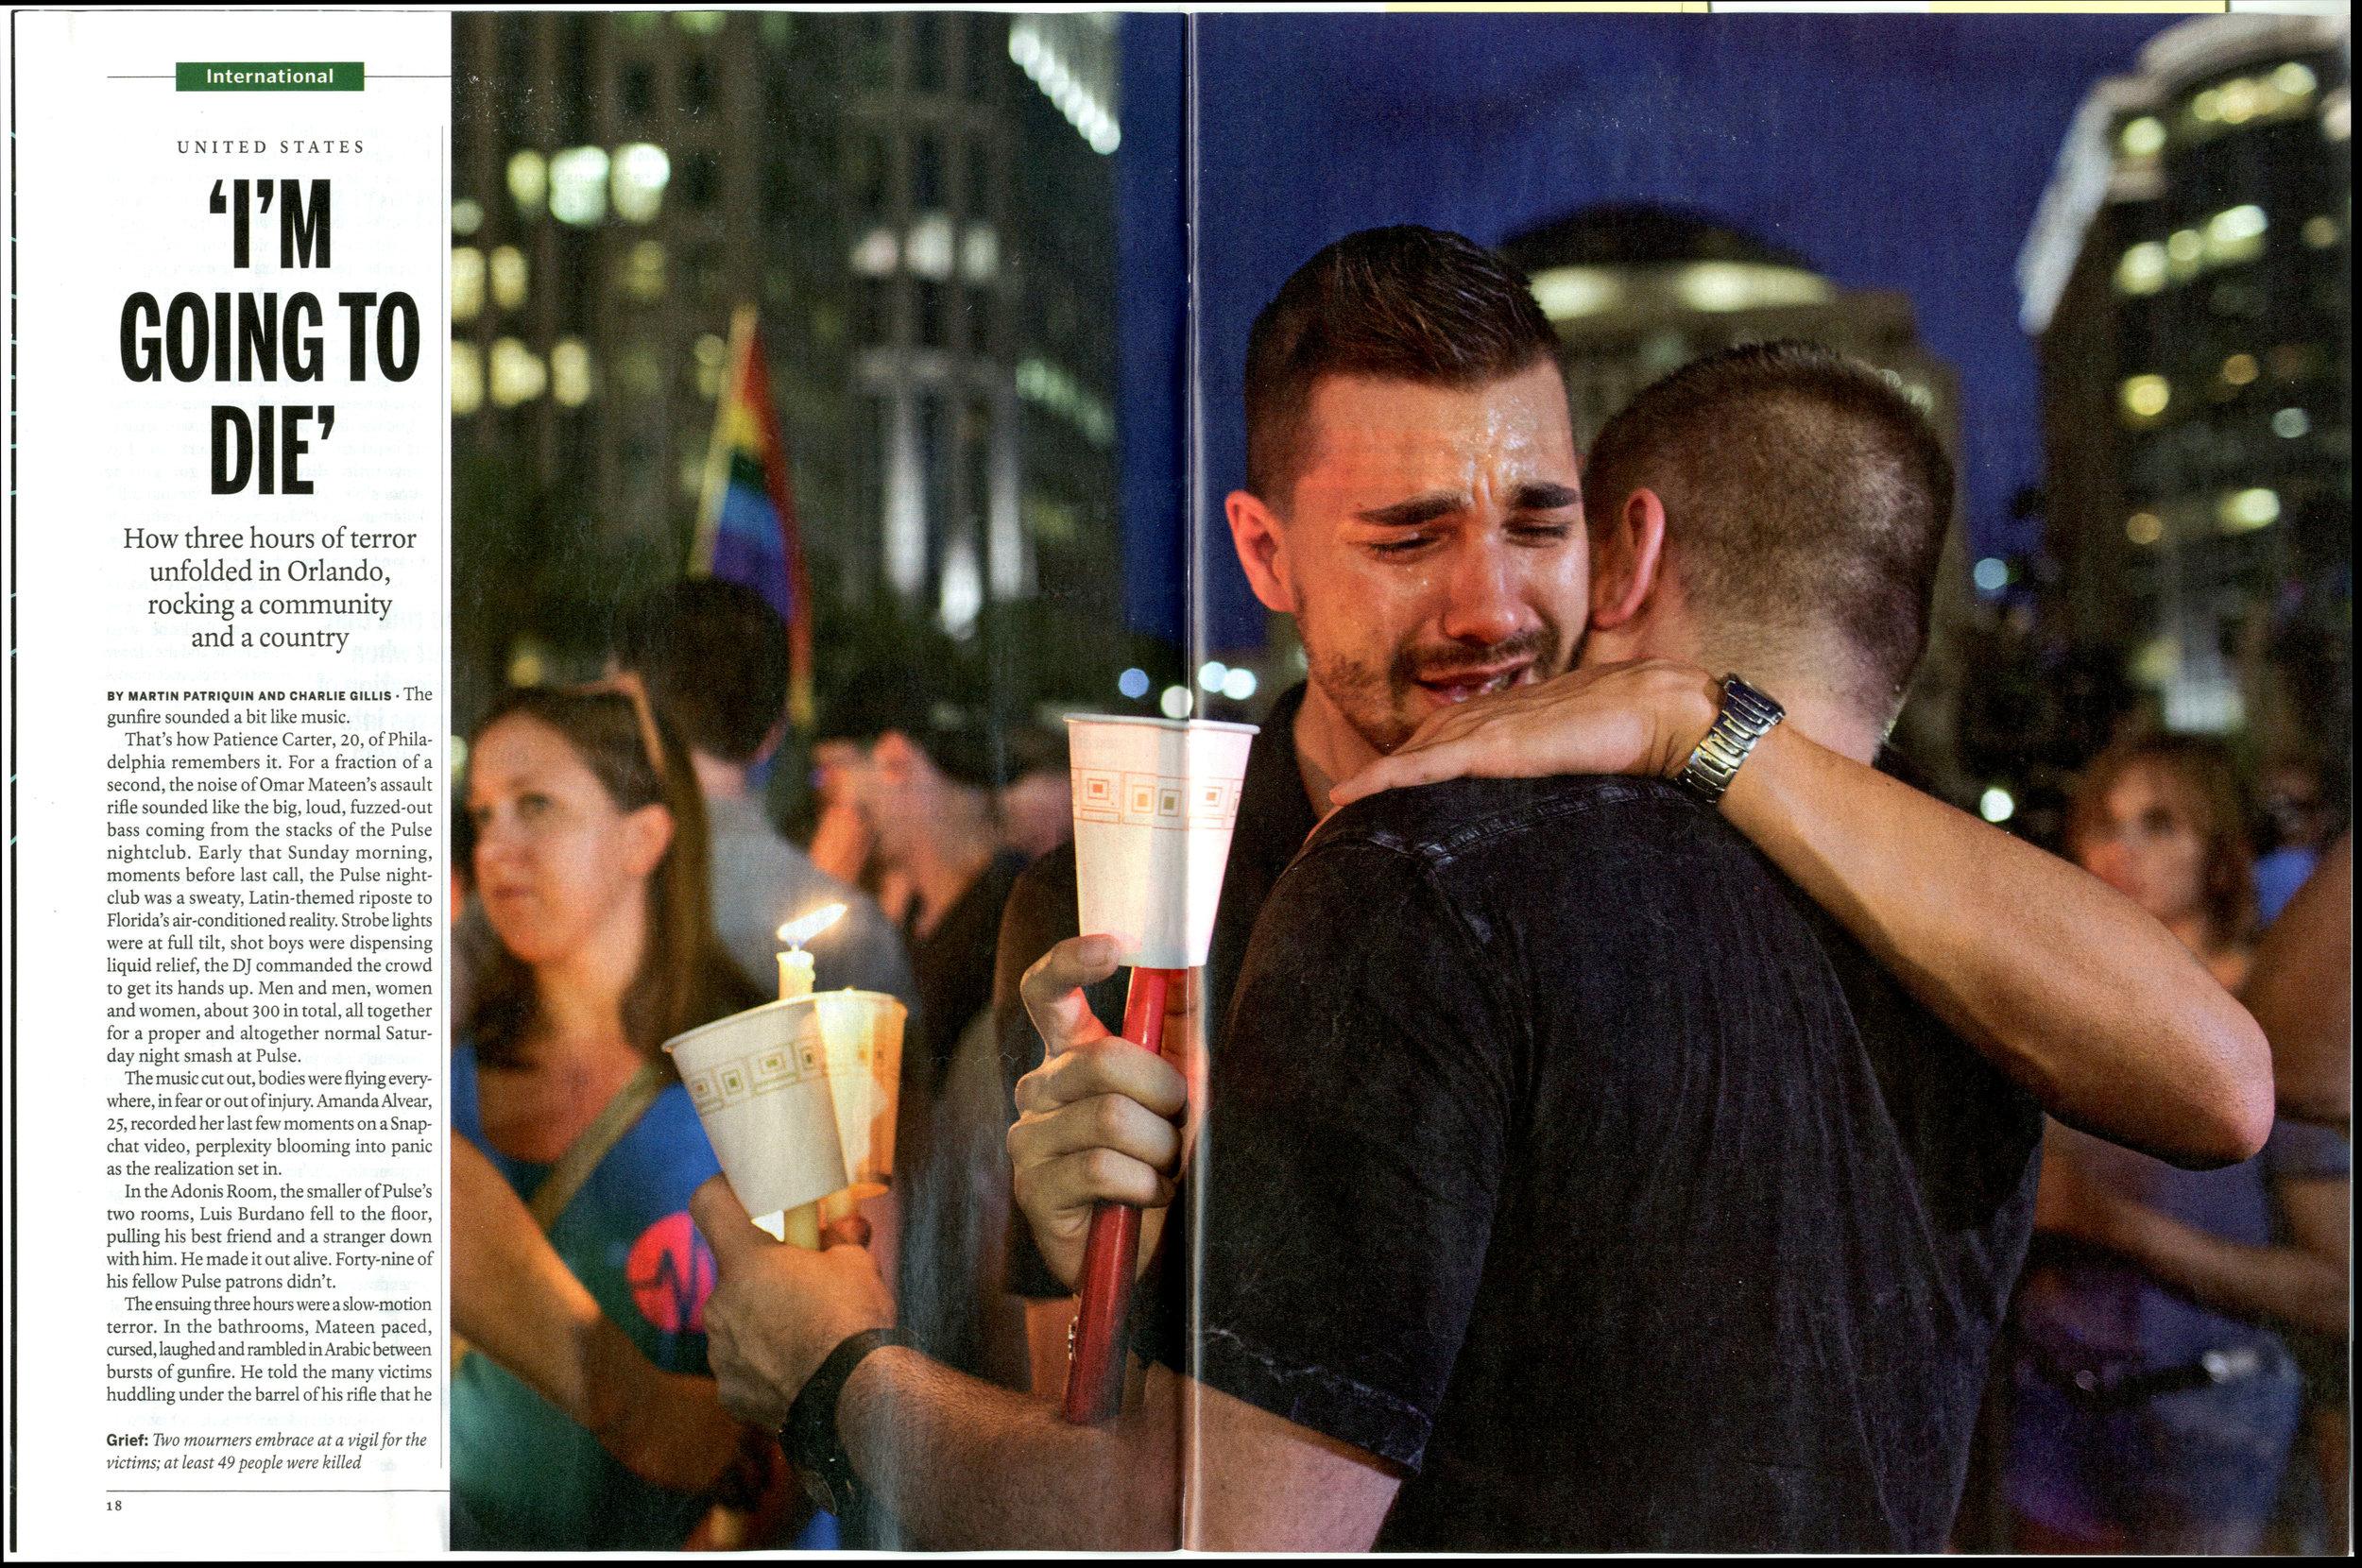 Pulse nightclub massacre for Maclean's Magazine